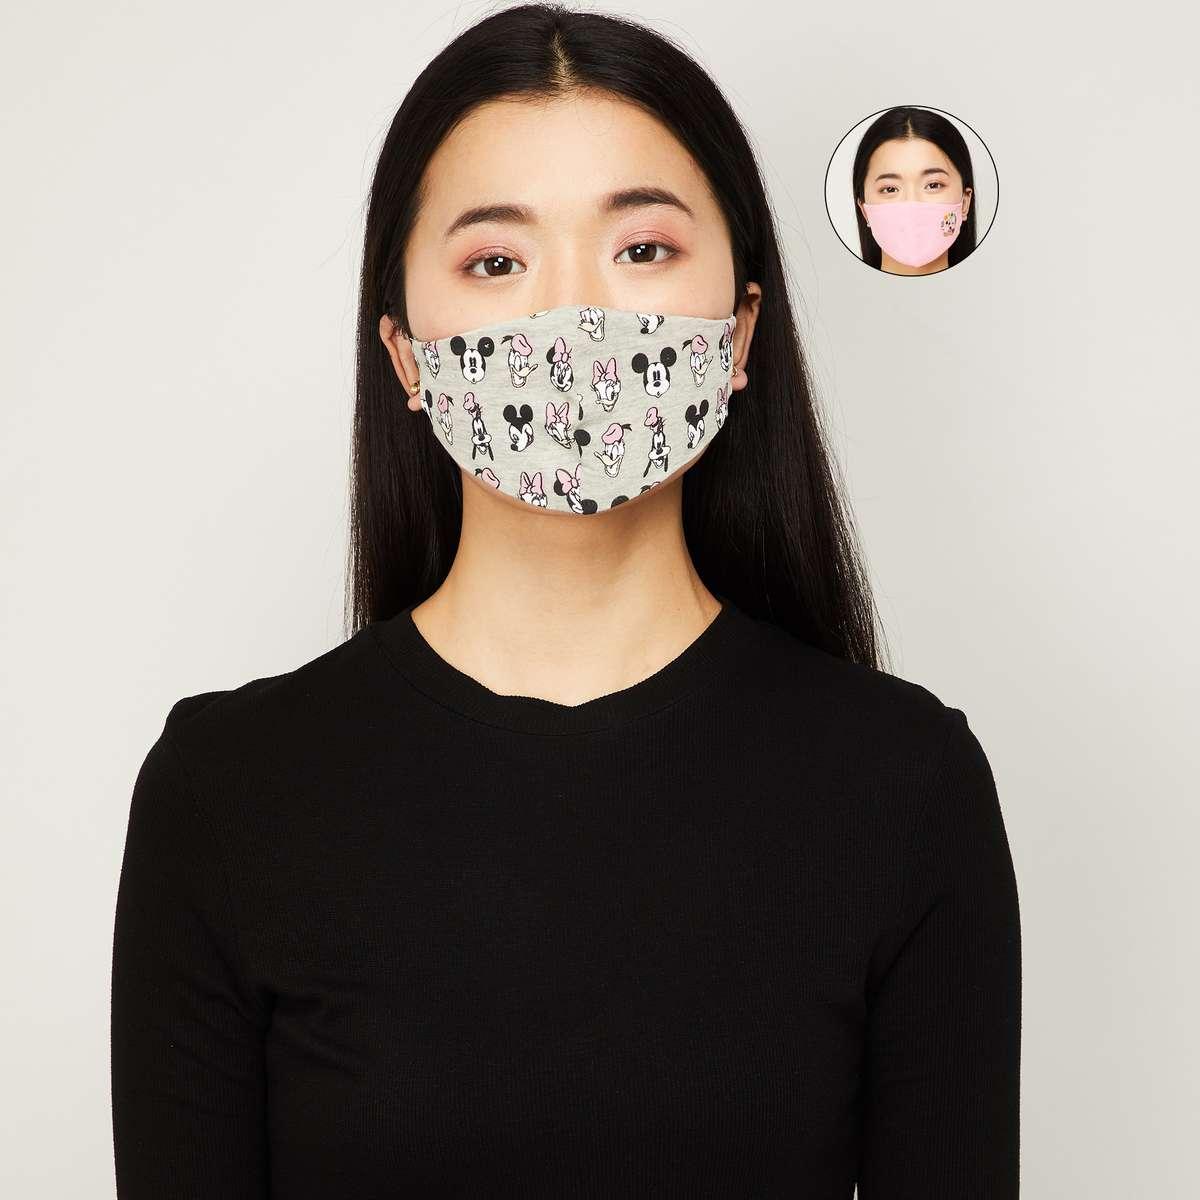 2.GINGER Women Printed Face Mask - Set of 2